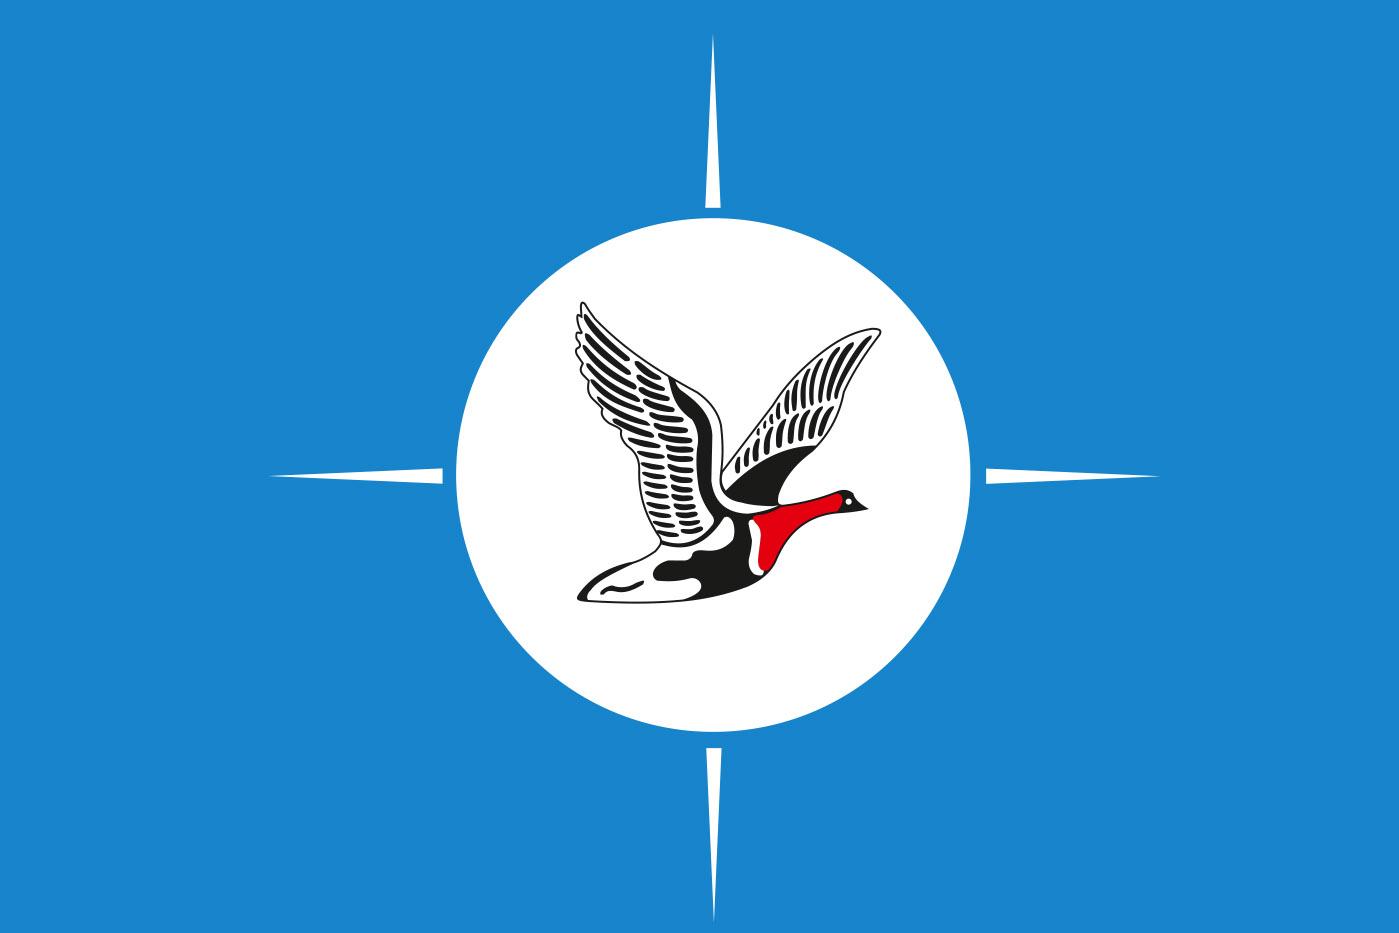 Флаг Таймырского Долгано-Ненецкого района